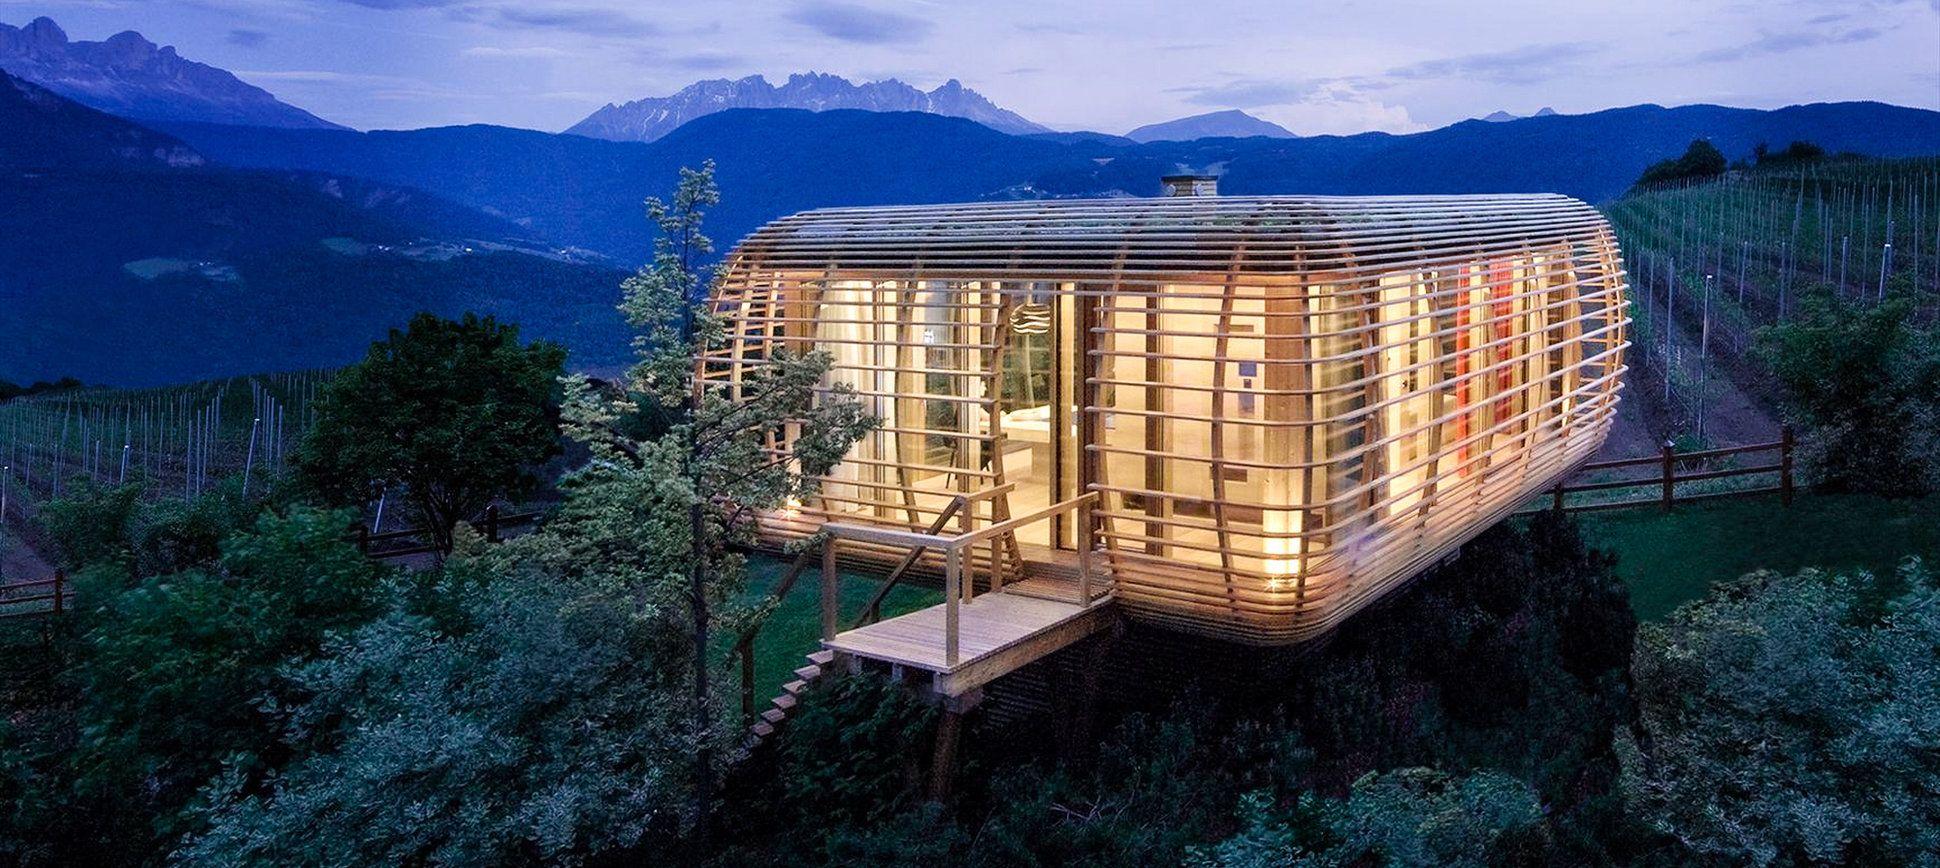 Beautifully Designed Small Winter Cabins 17 Amazing